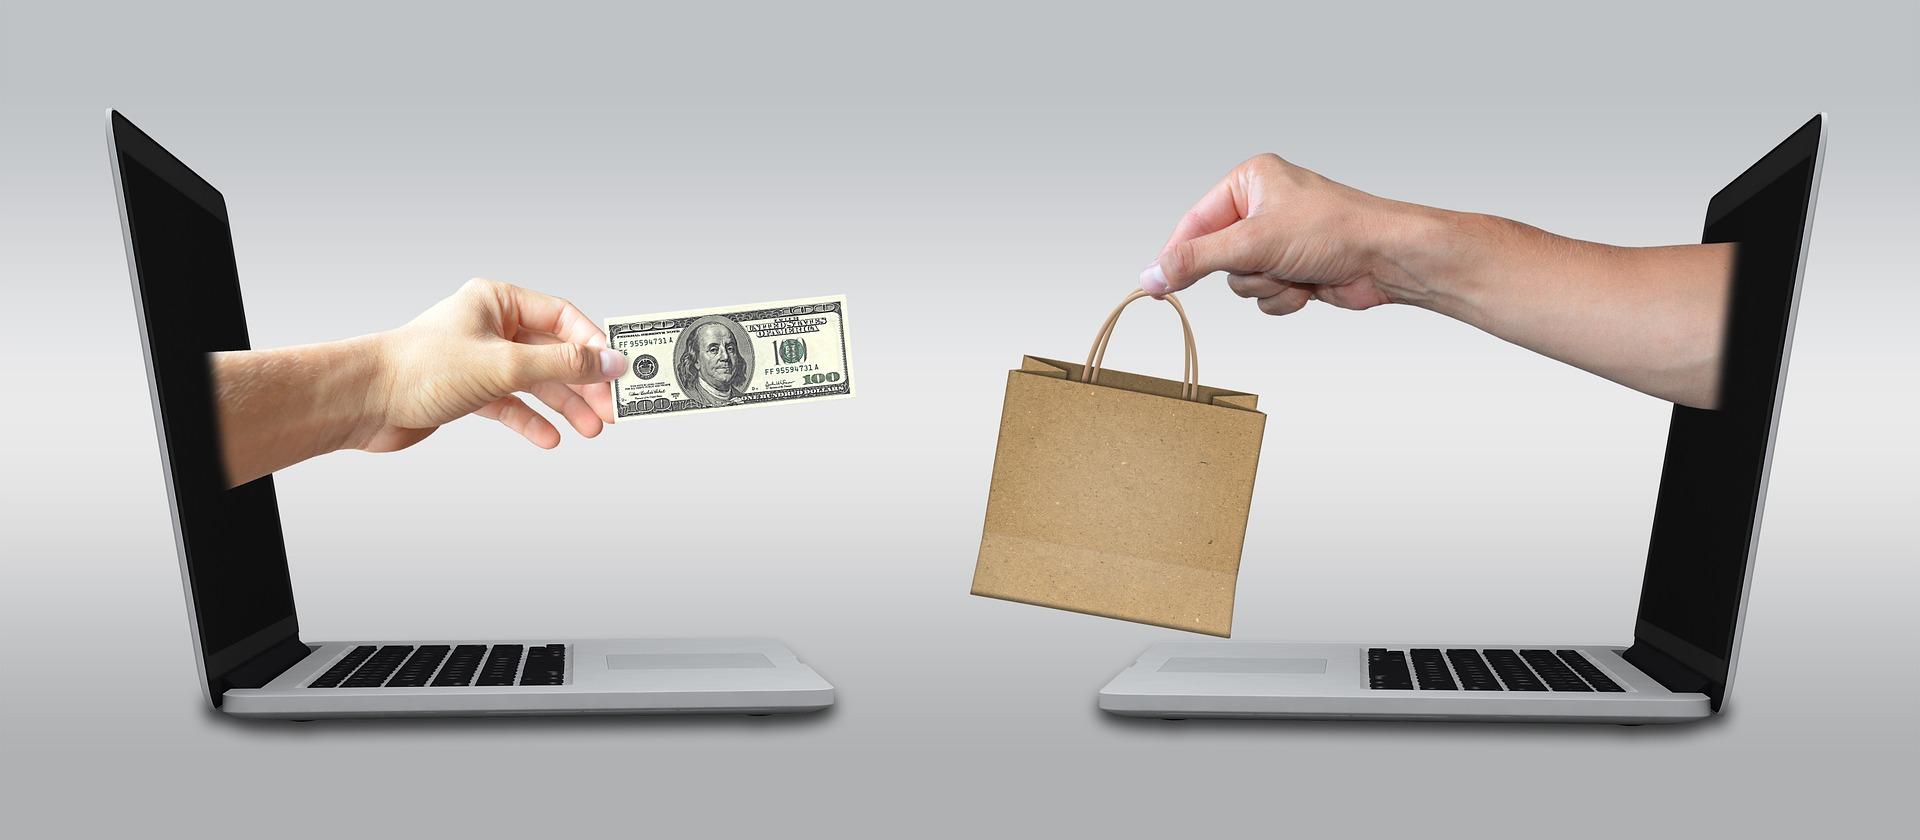 Online retailer online business ideas 2021